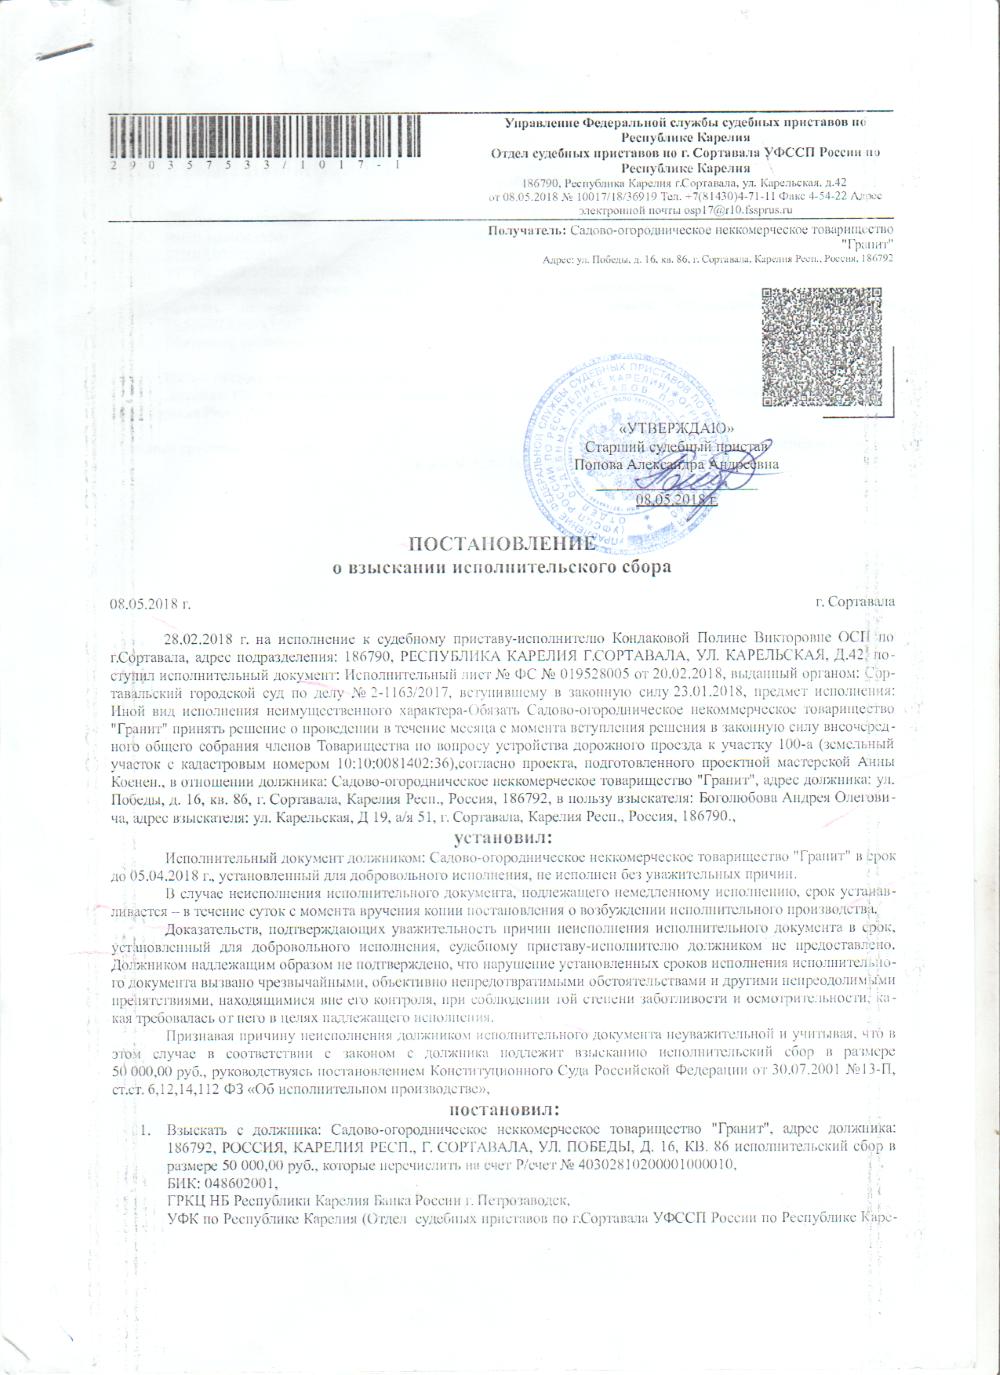 https://sontgranit.ru/forum/img/sokol/исп-сбор-50-3.png